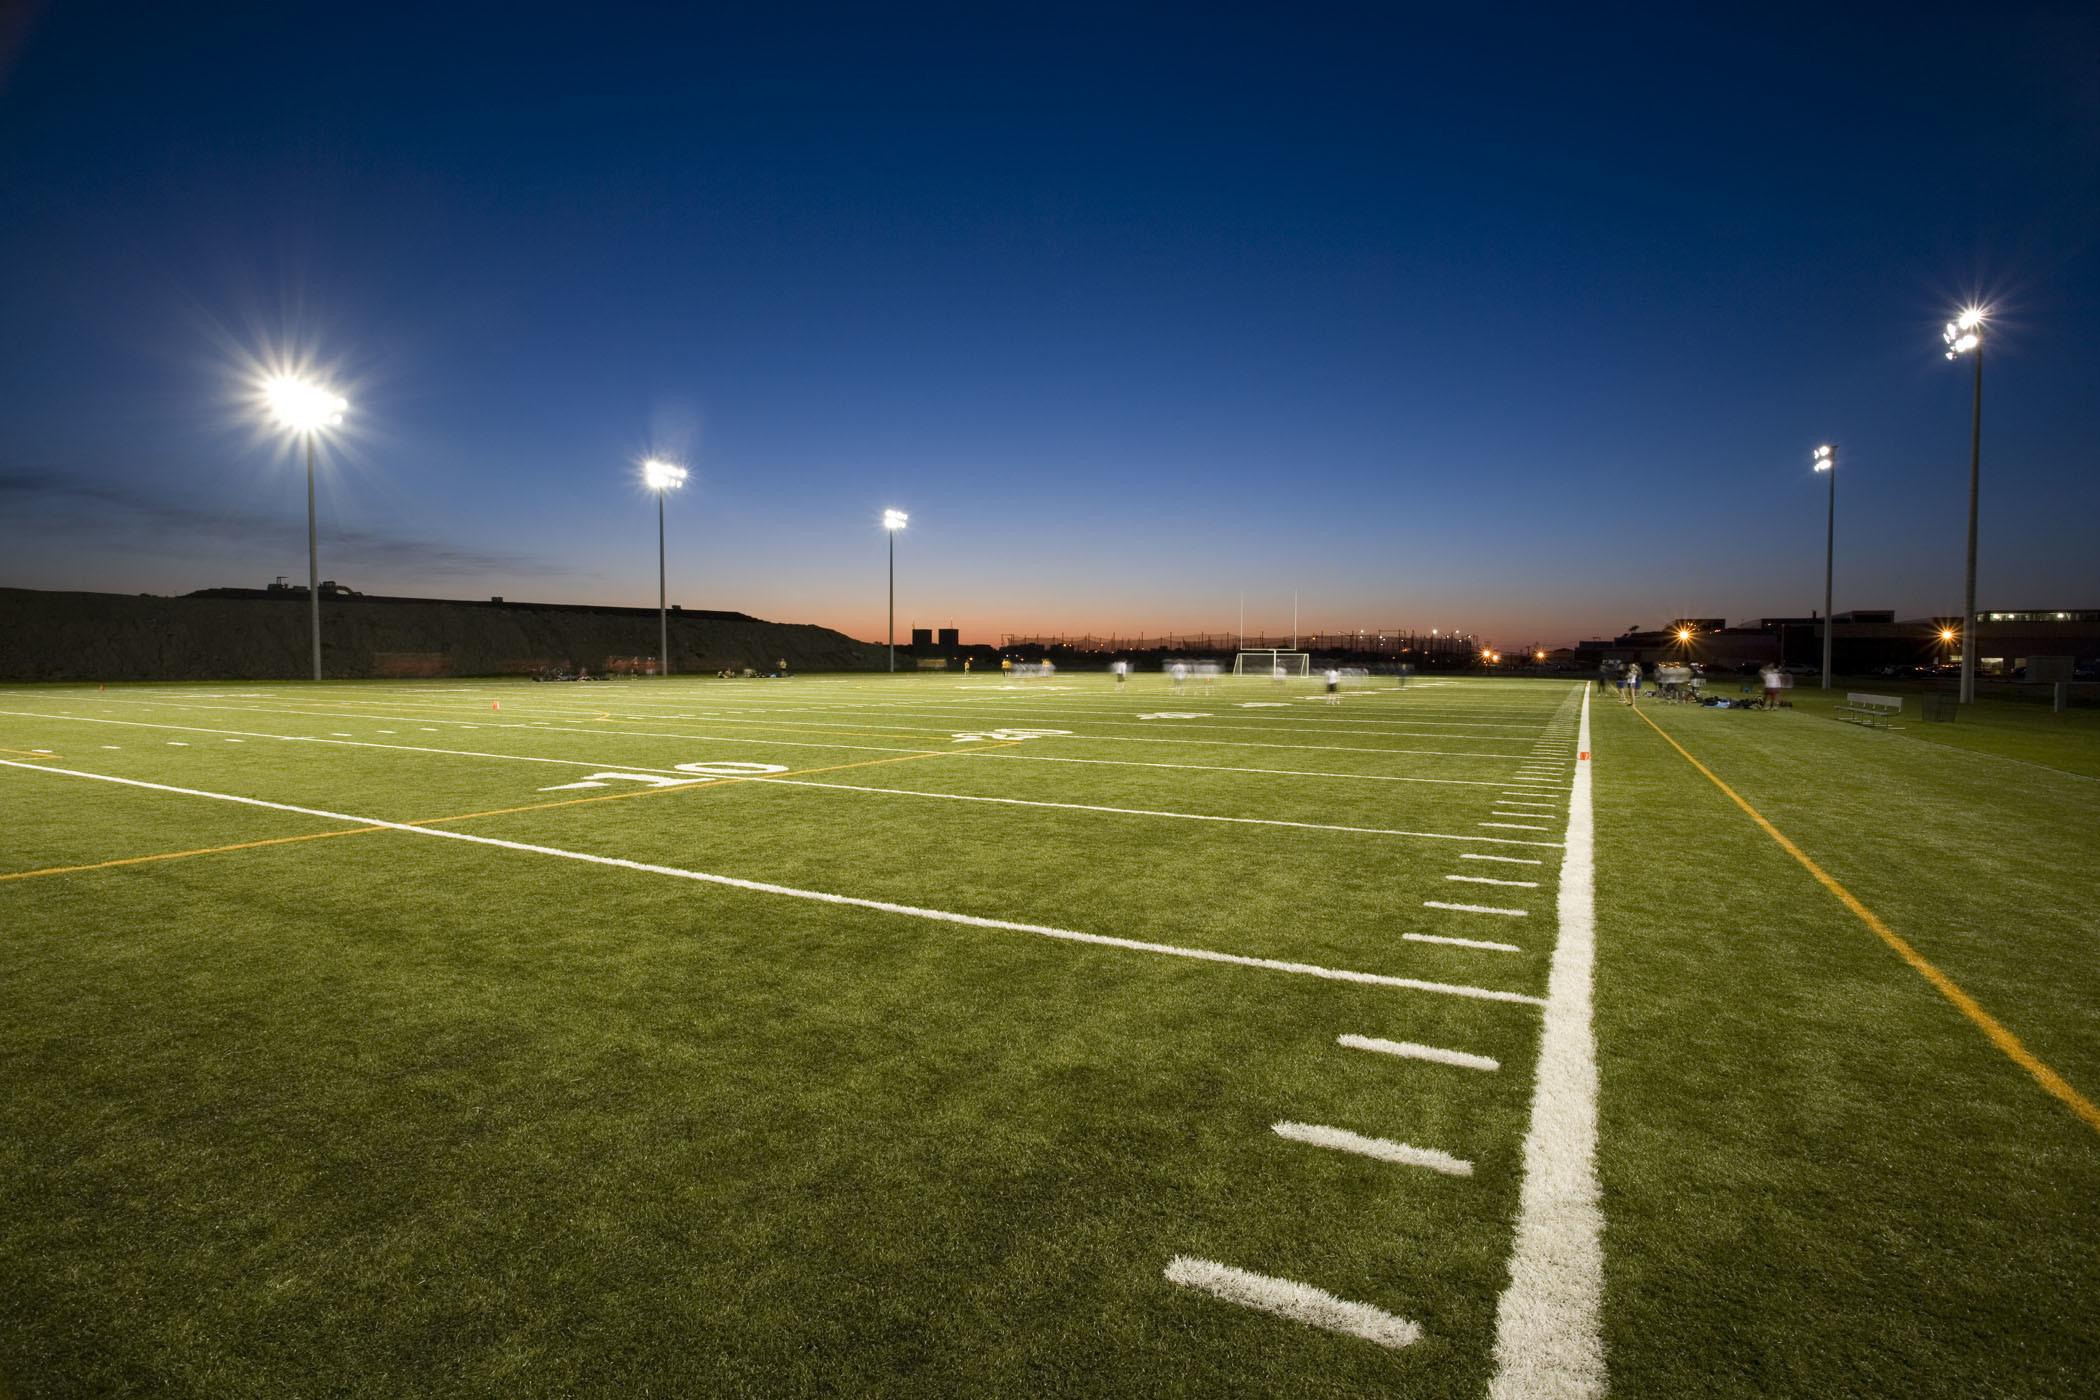 Download High School Football Wallpaper Gallery